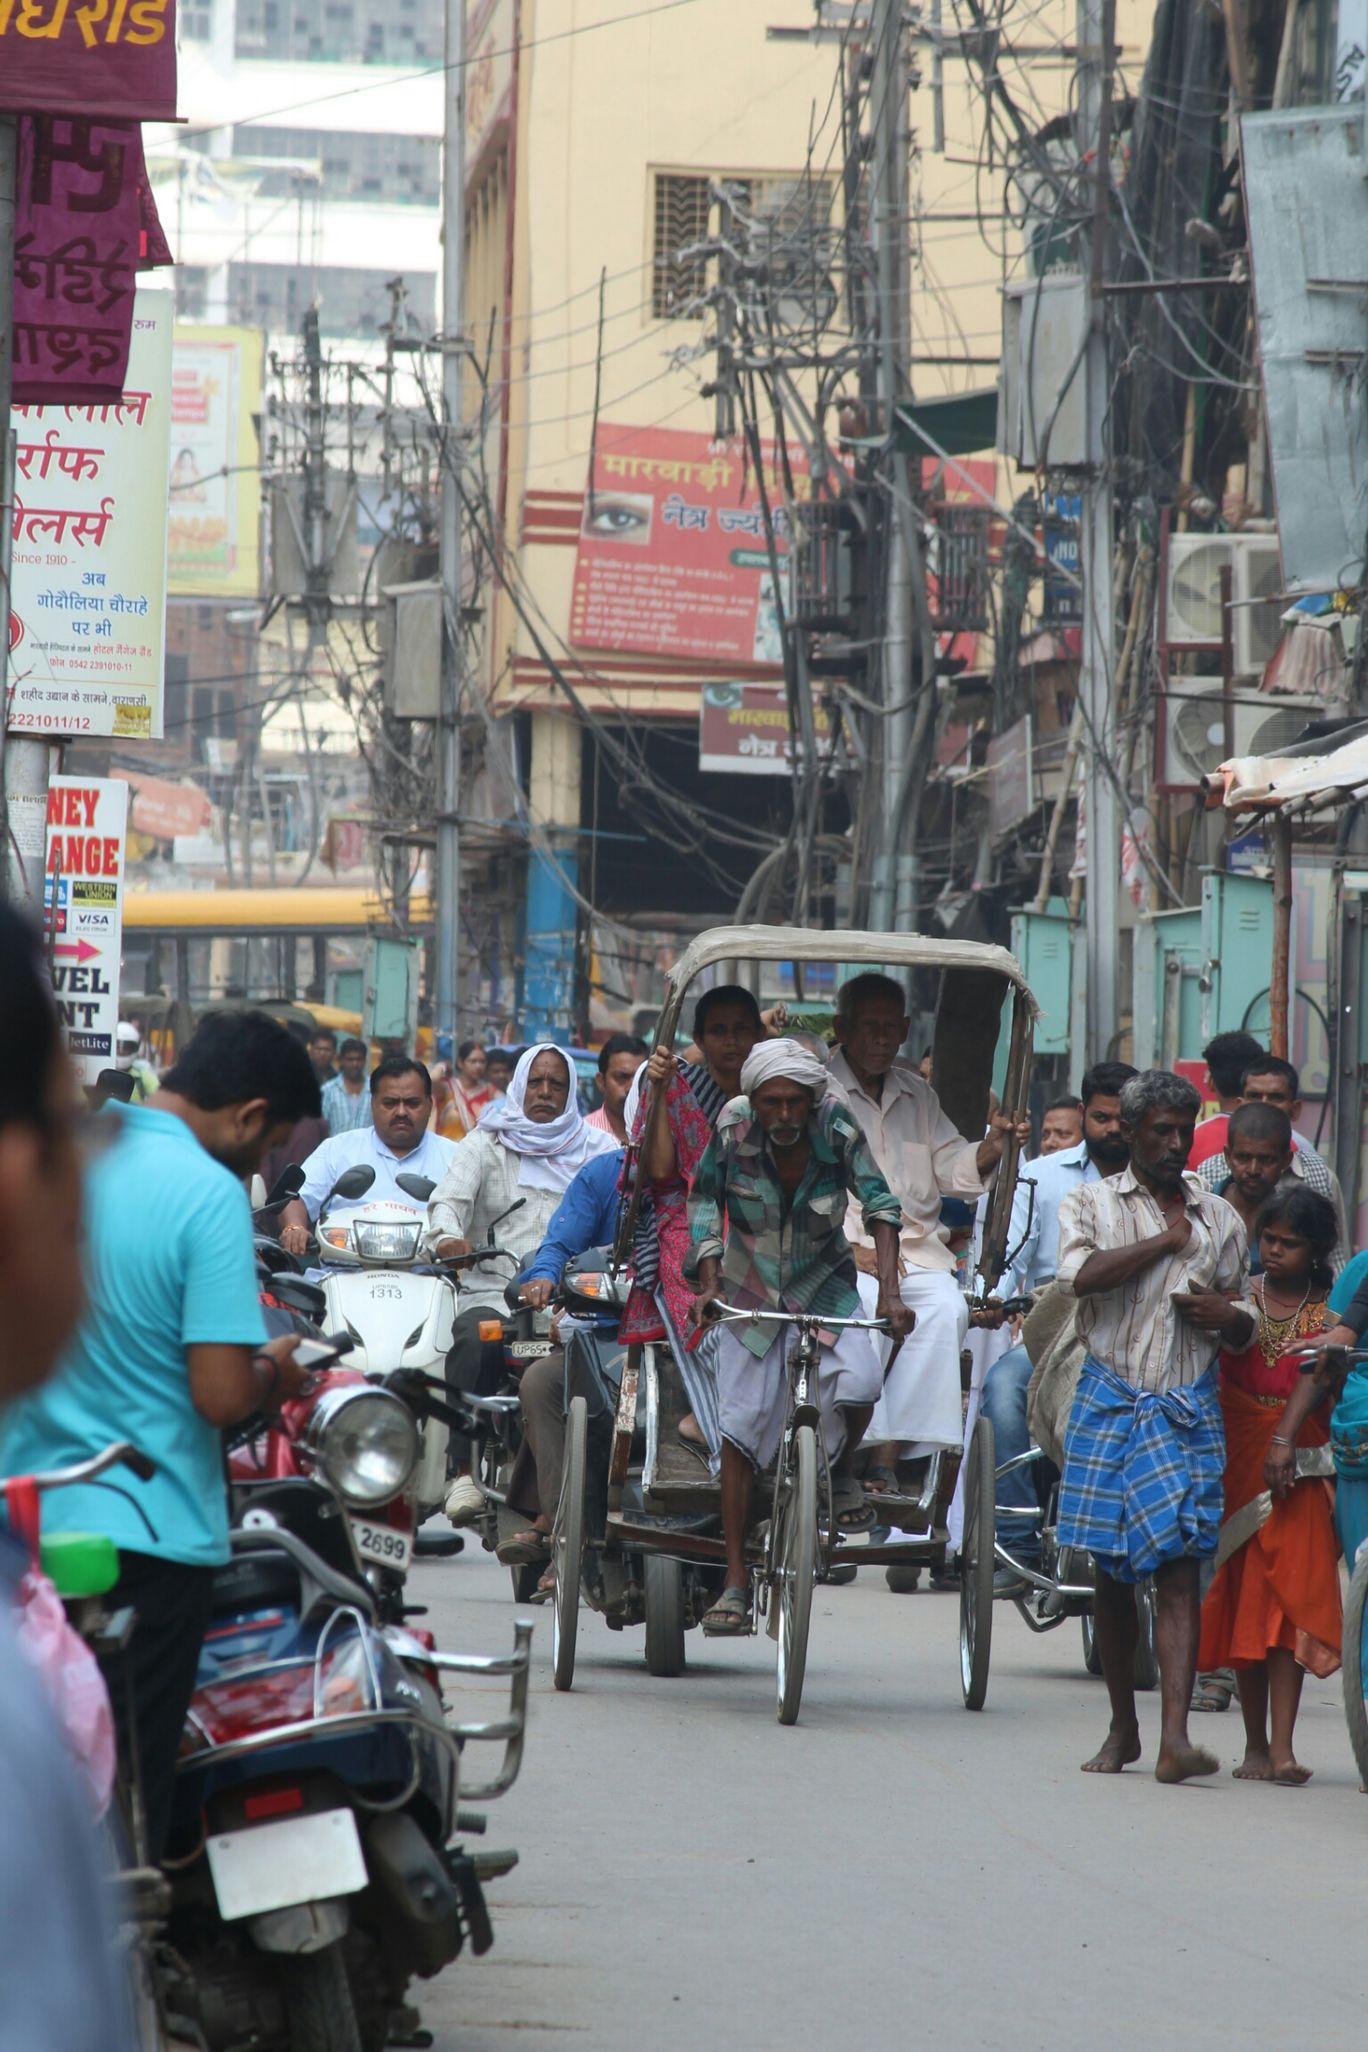 Photo of Varanasi By Akhil krishna